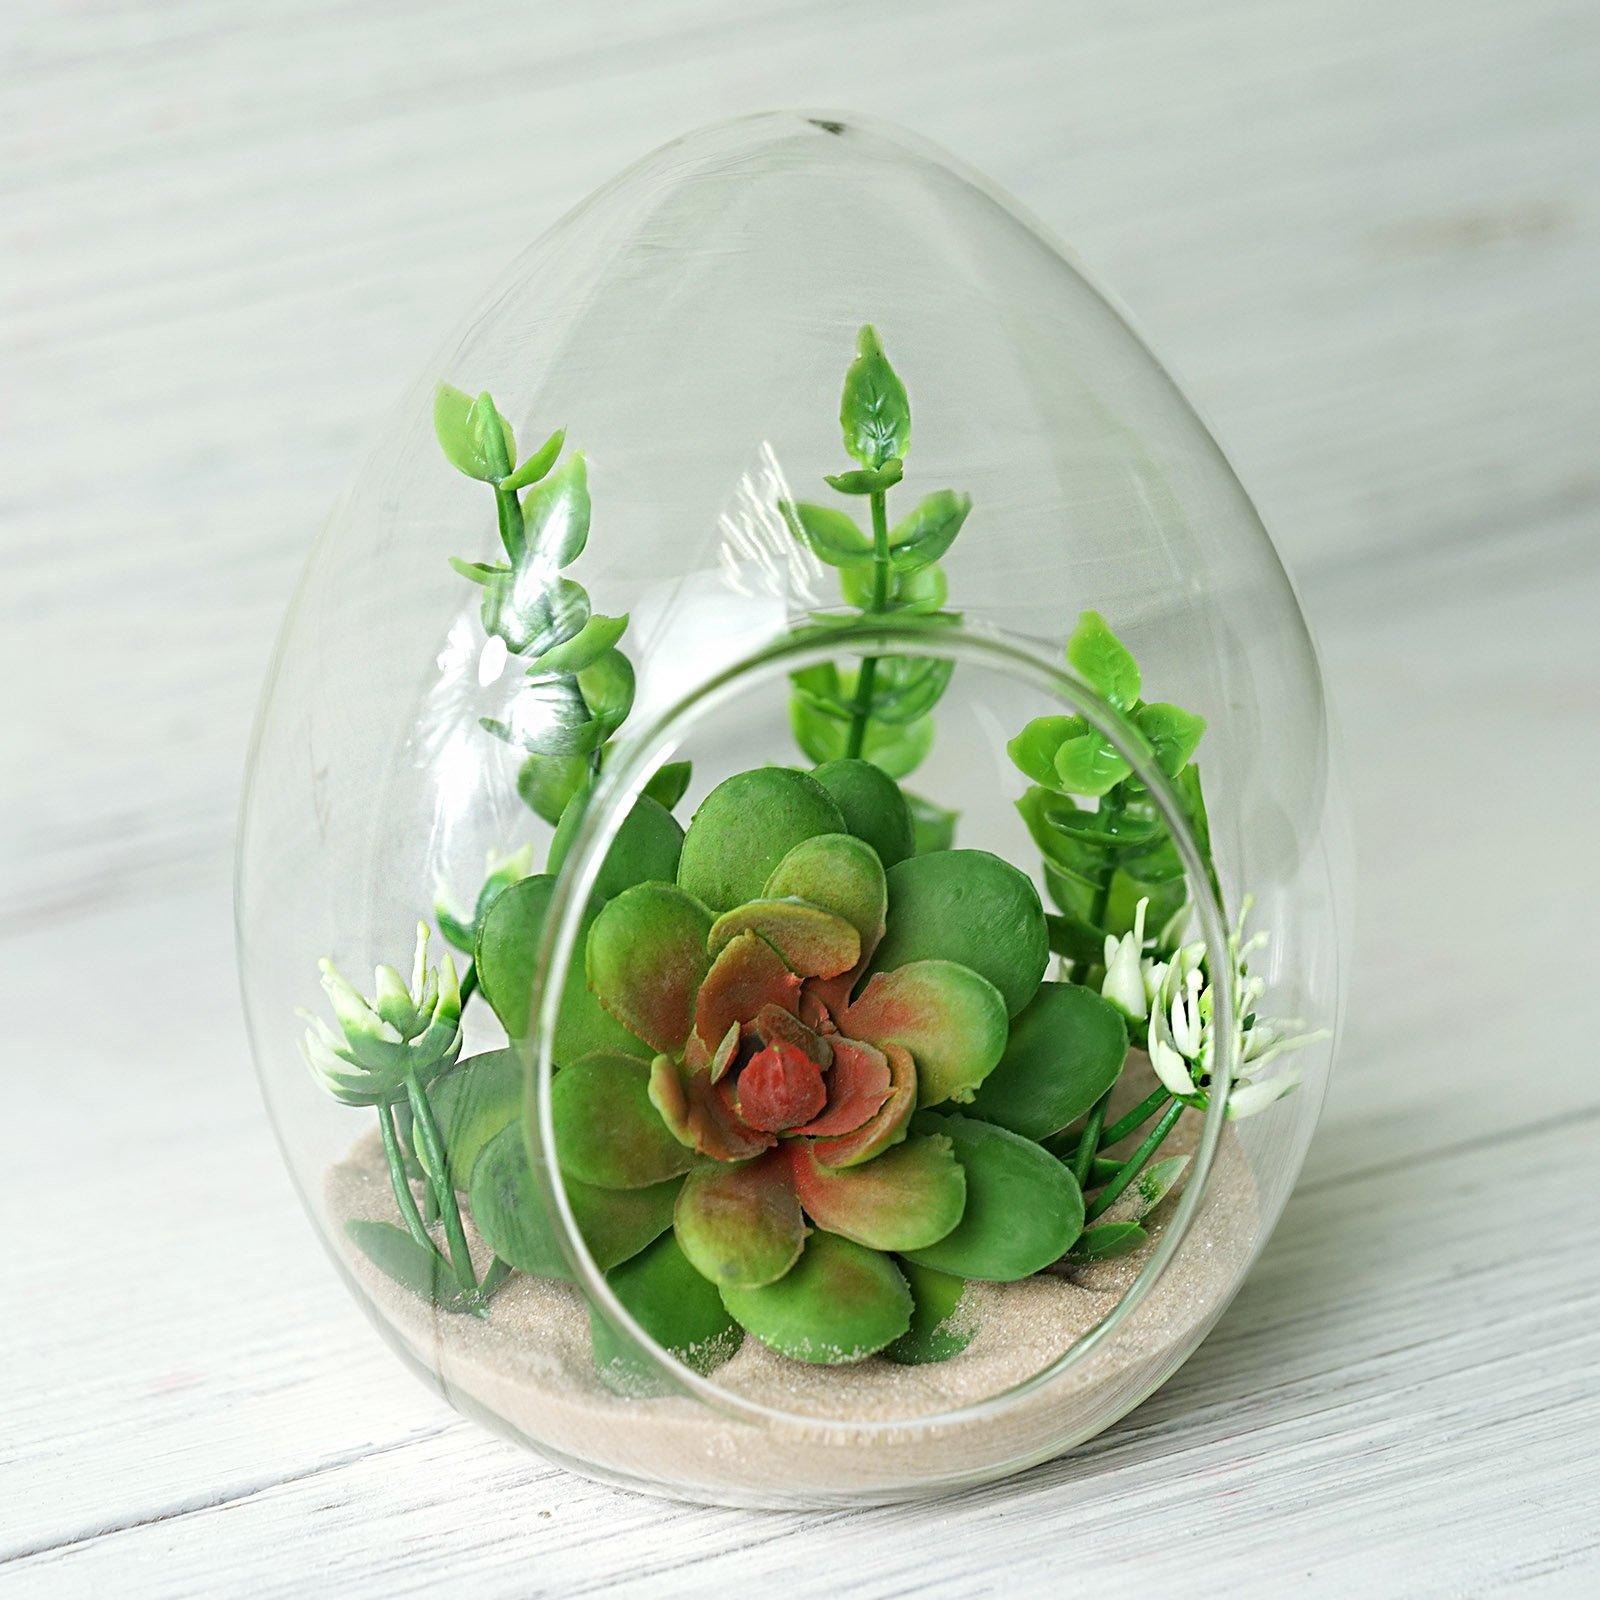 6 Clear Glass Egg Terrariums Centerpiece Wedding Party Wholesale Decorations Ebay